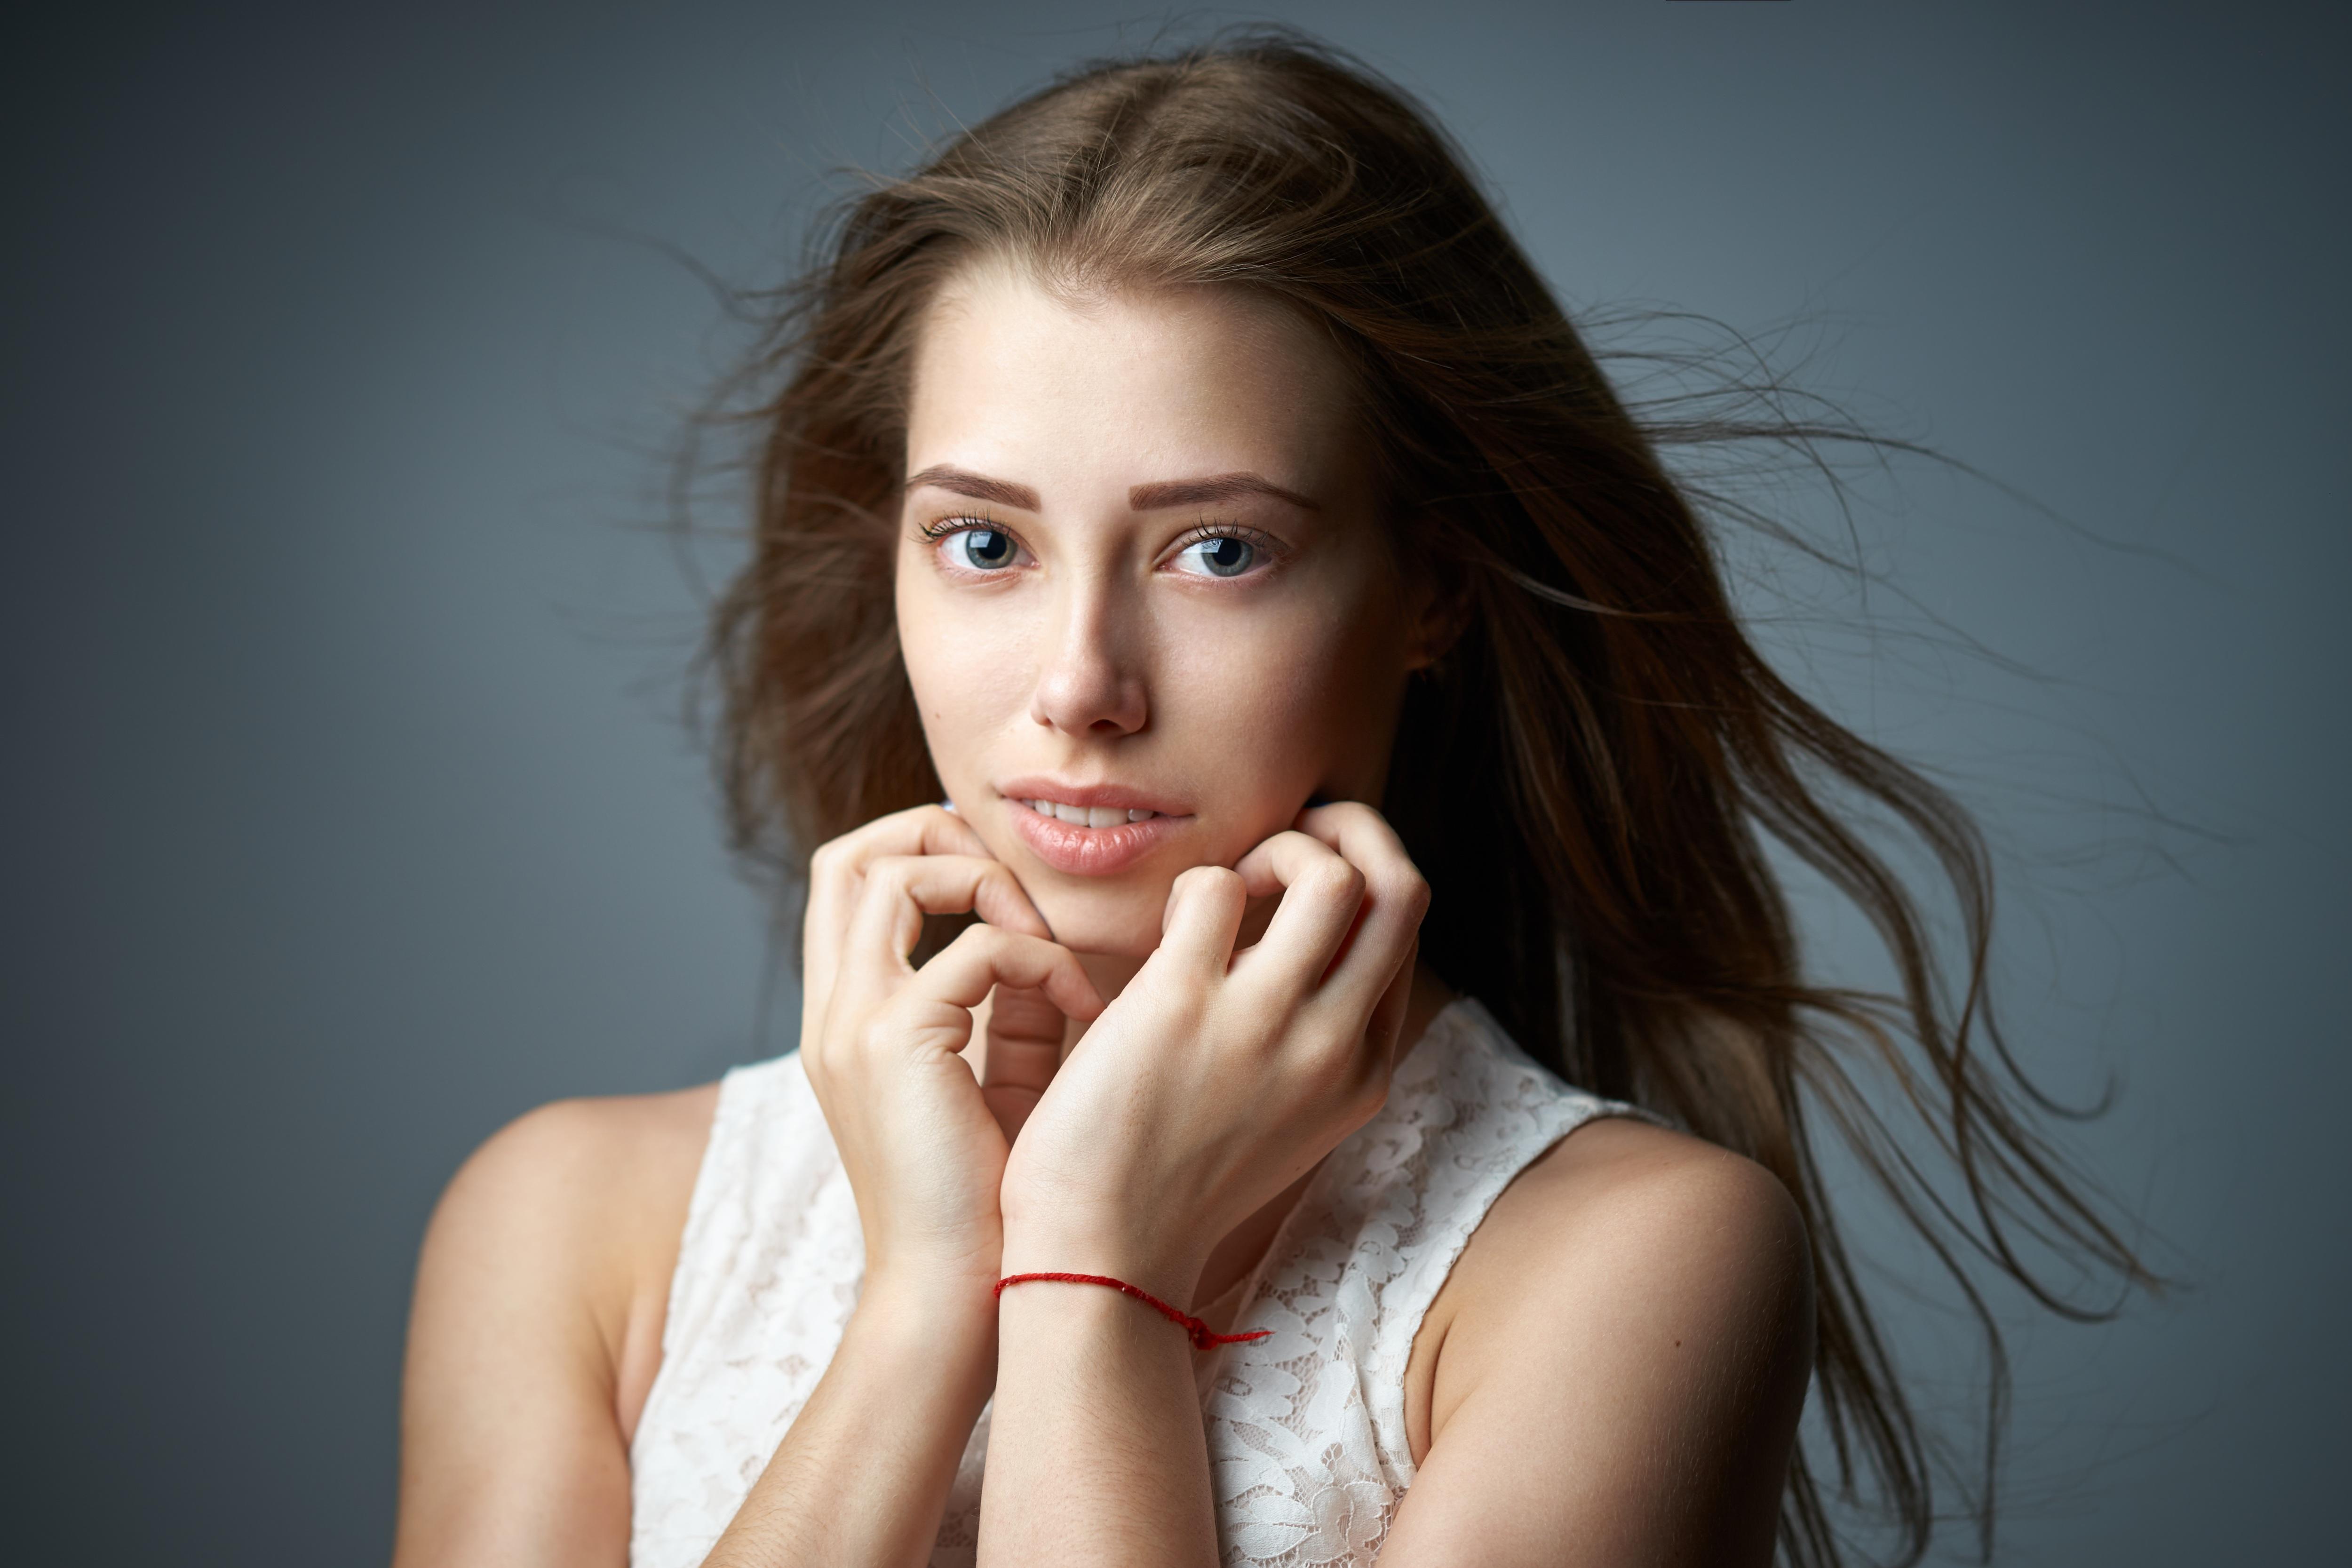 Вера бирюкова гимнастка фото